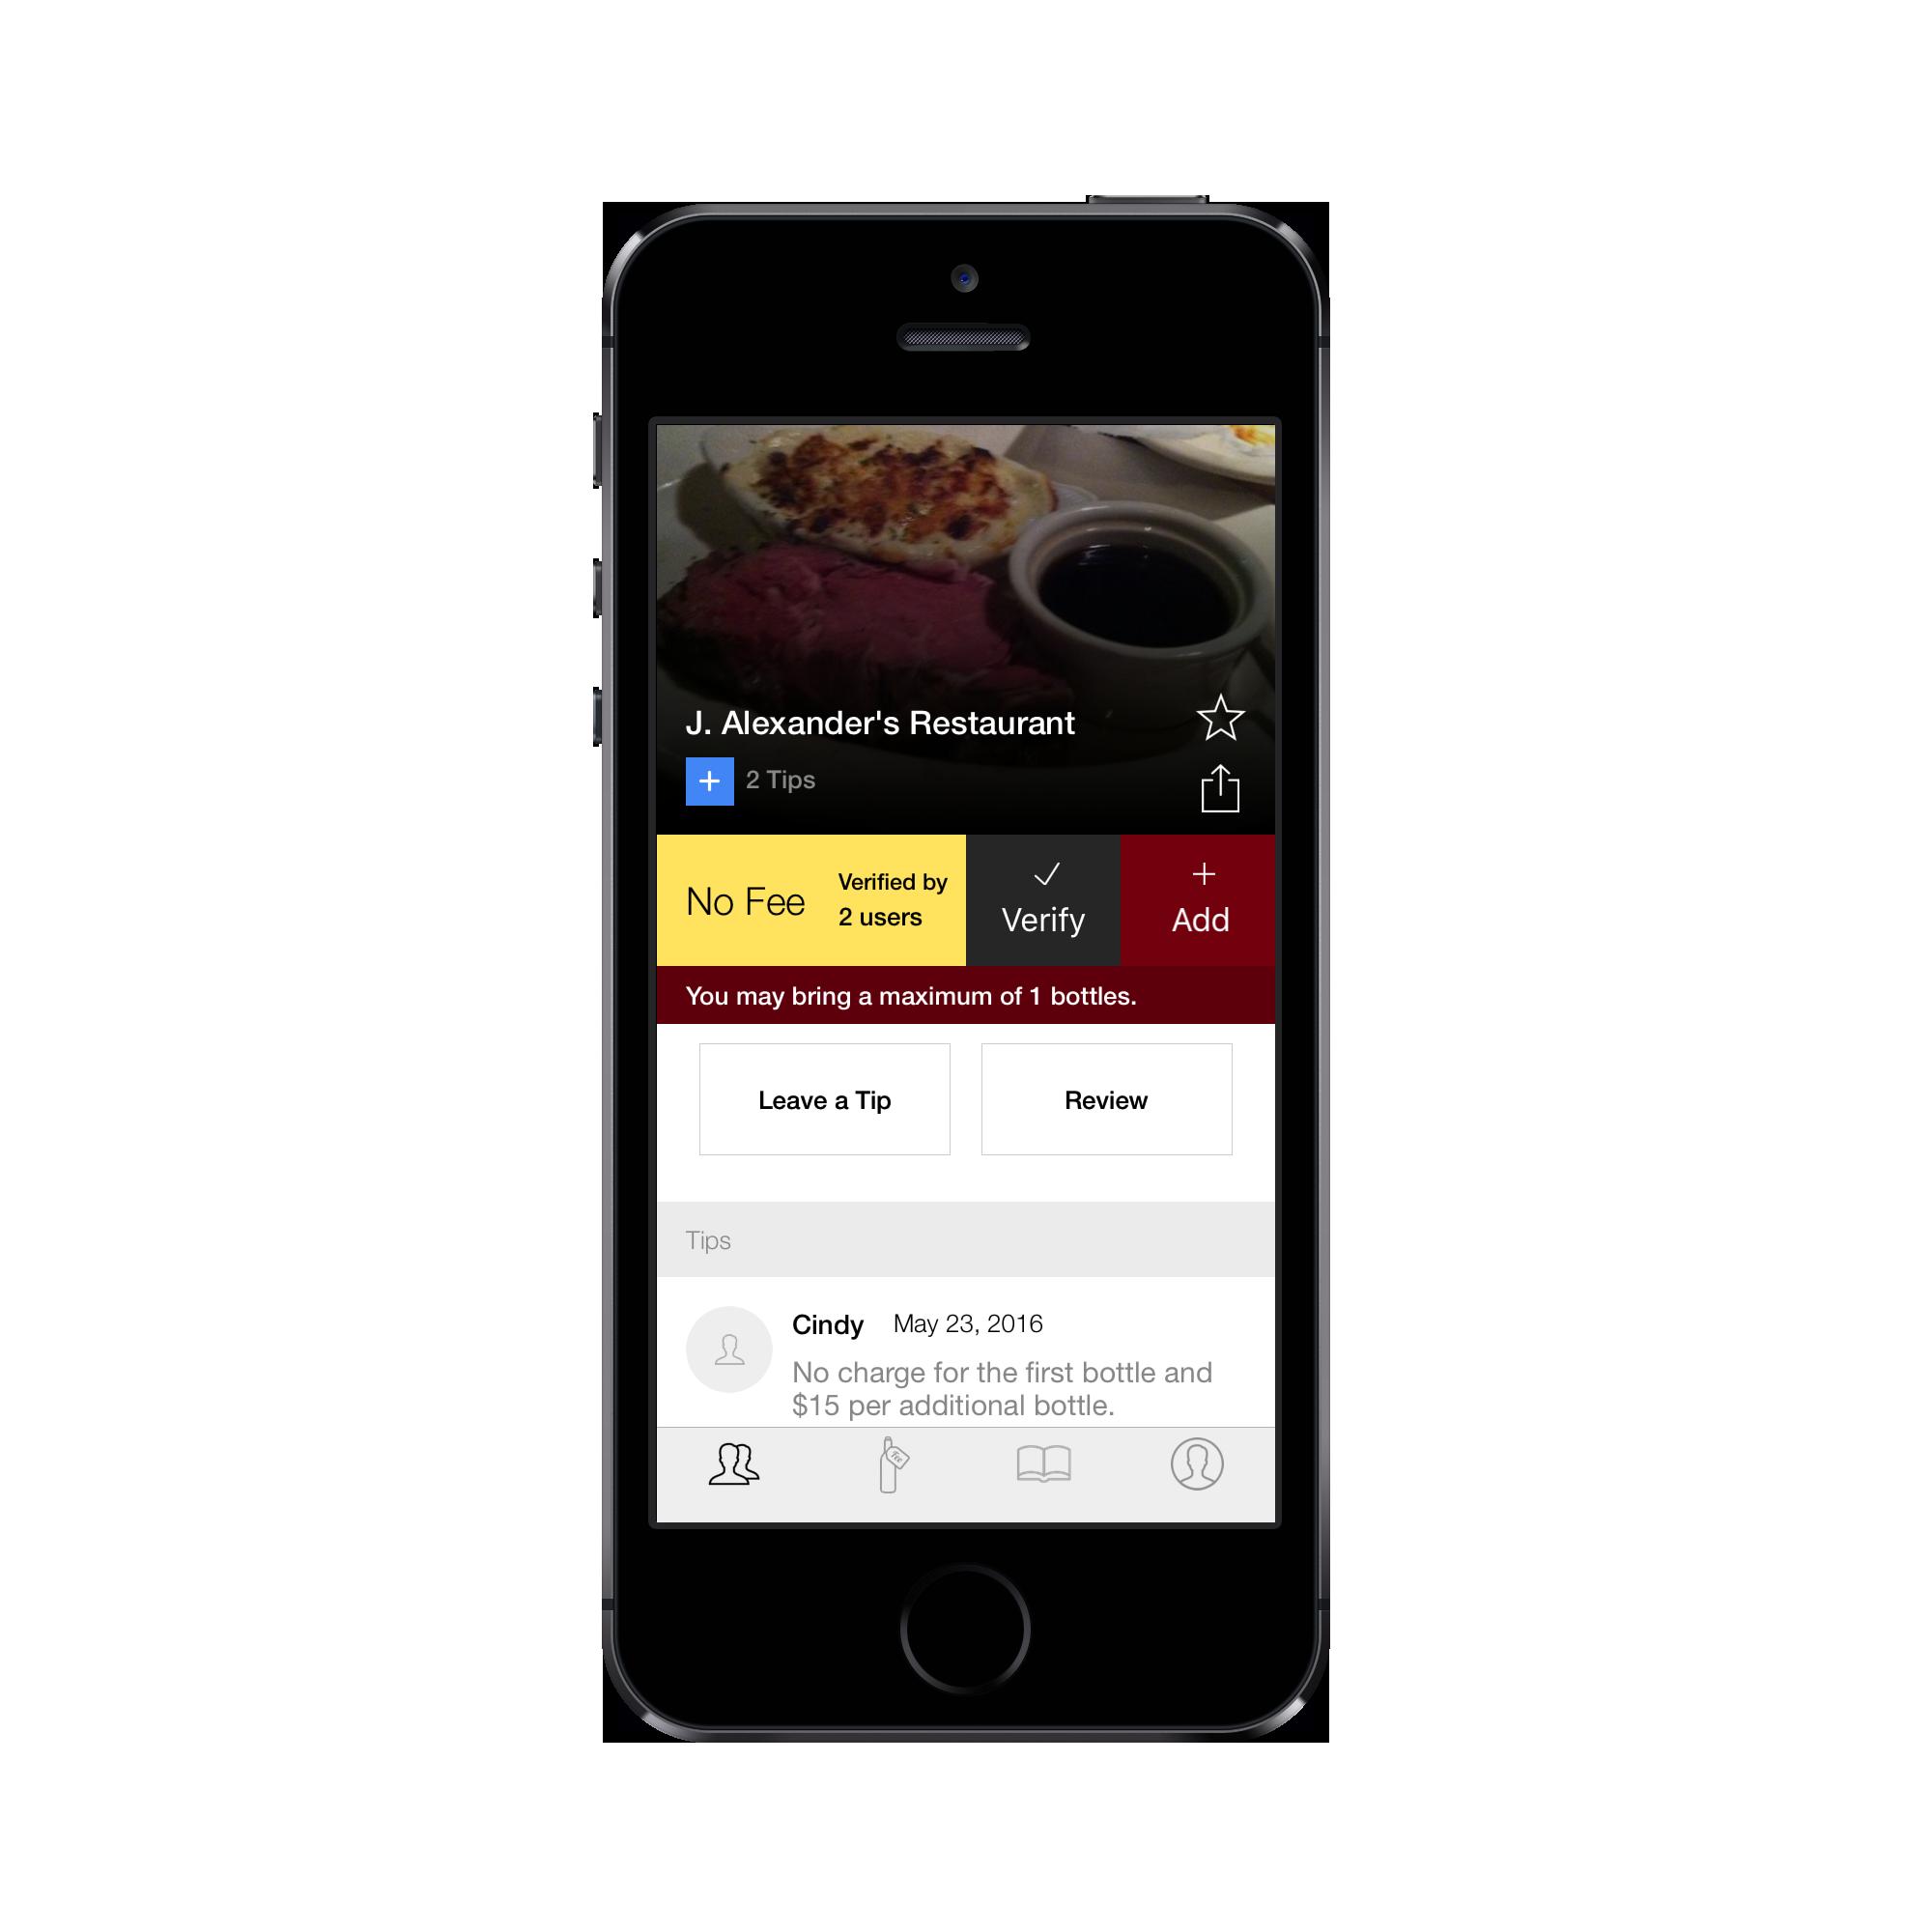 J. Alexander's Restaurant - Overland Park, KS corkage fee